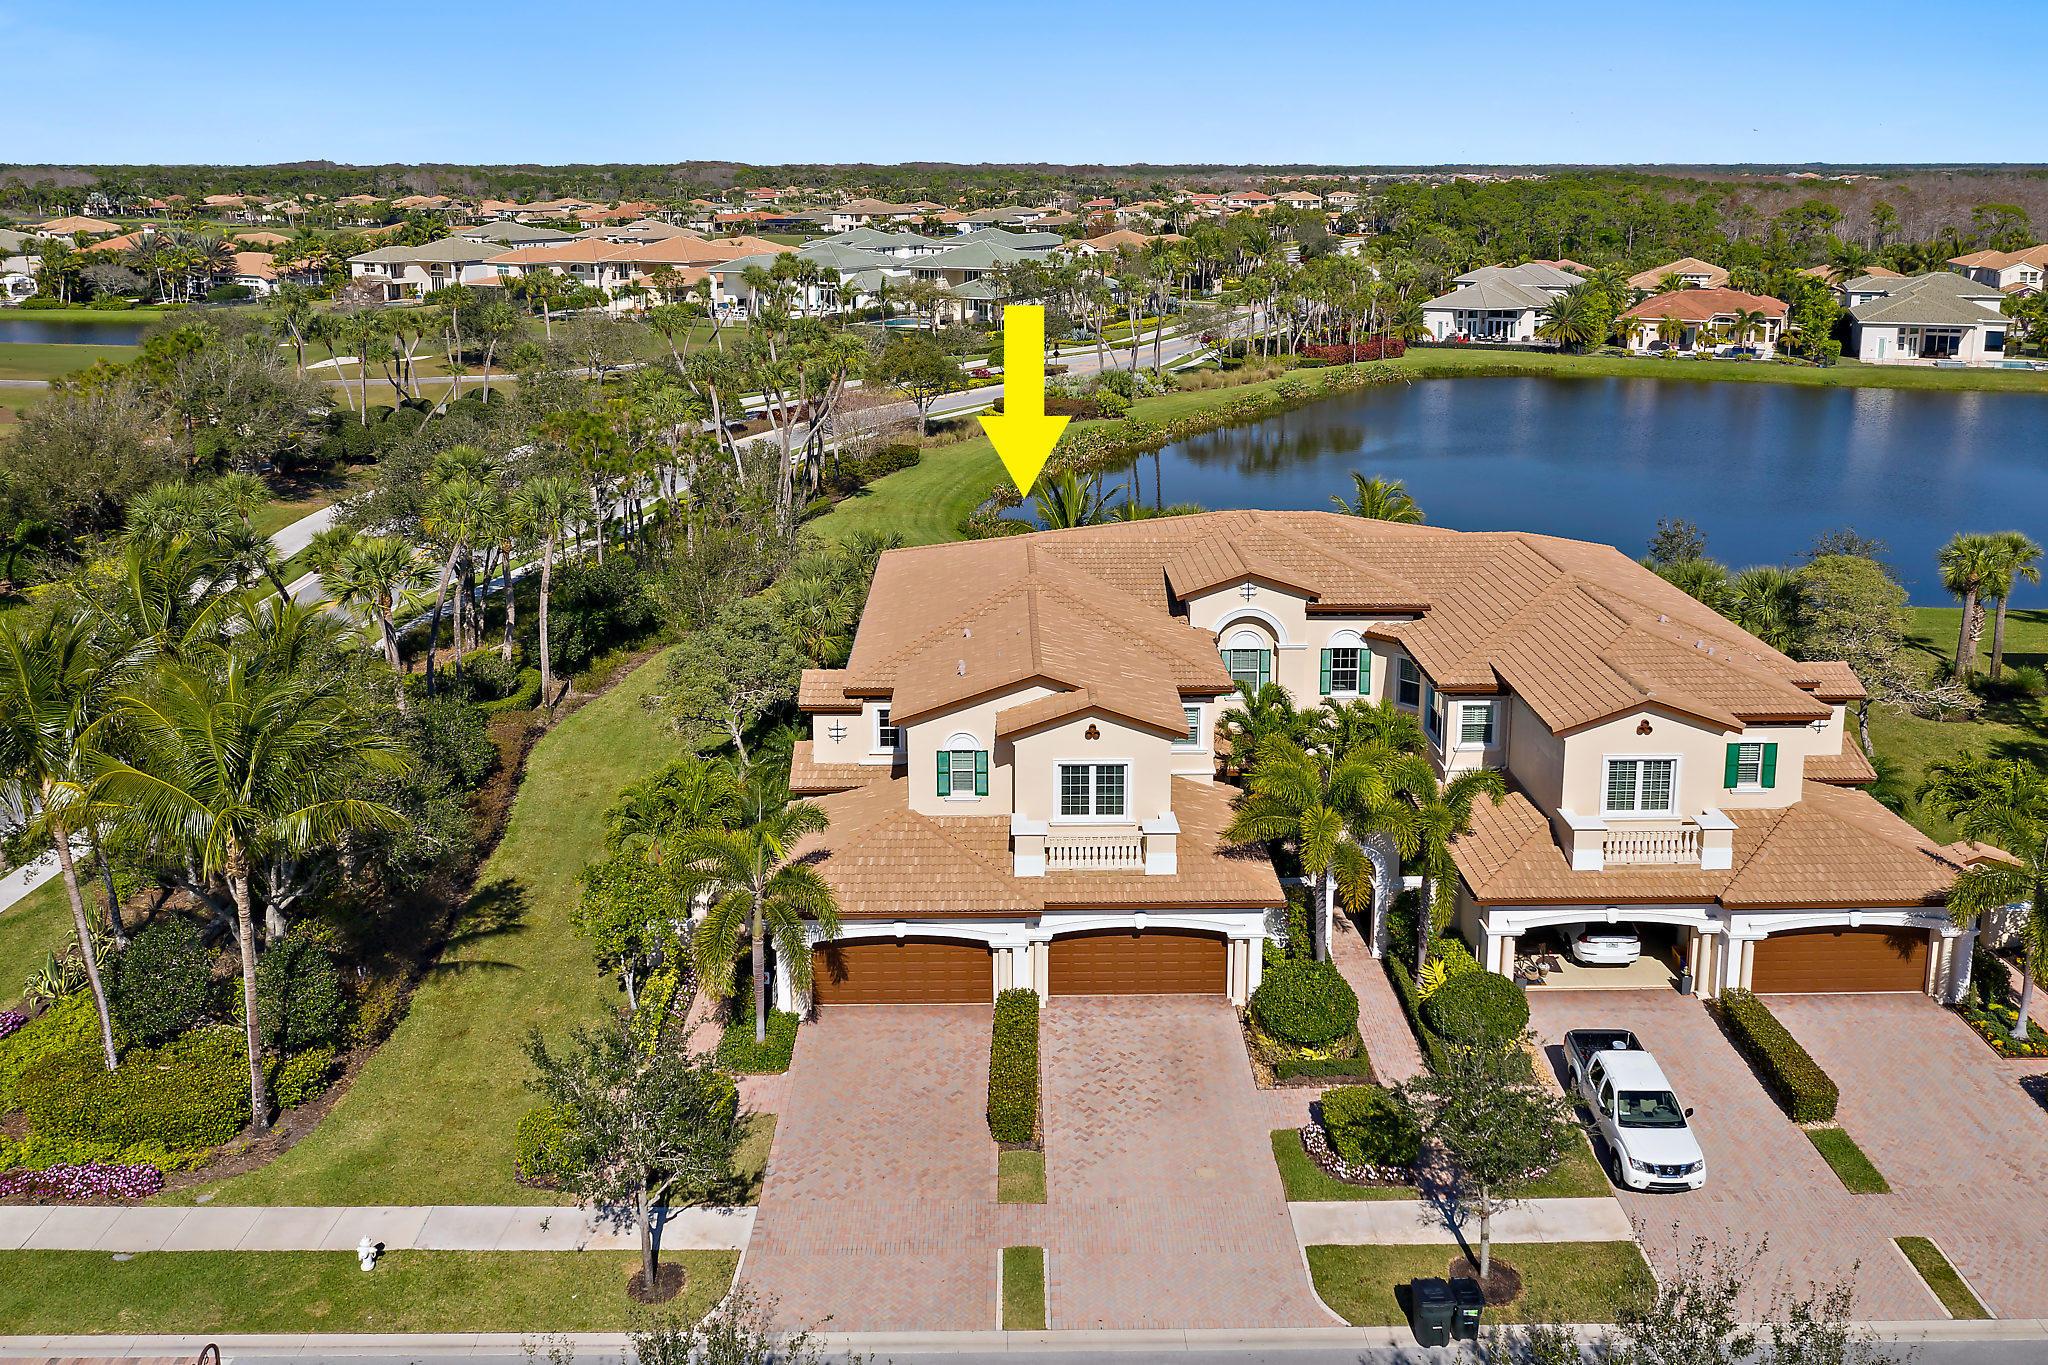 99 Tresana Boulevard 1, Jupiter, Florida 33478, 3 Bedrooms Bedrooms, ,3 BathroomsBathrooms,A,Condominium,Tresana,RX-10598910